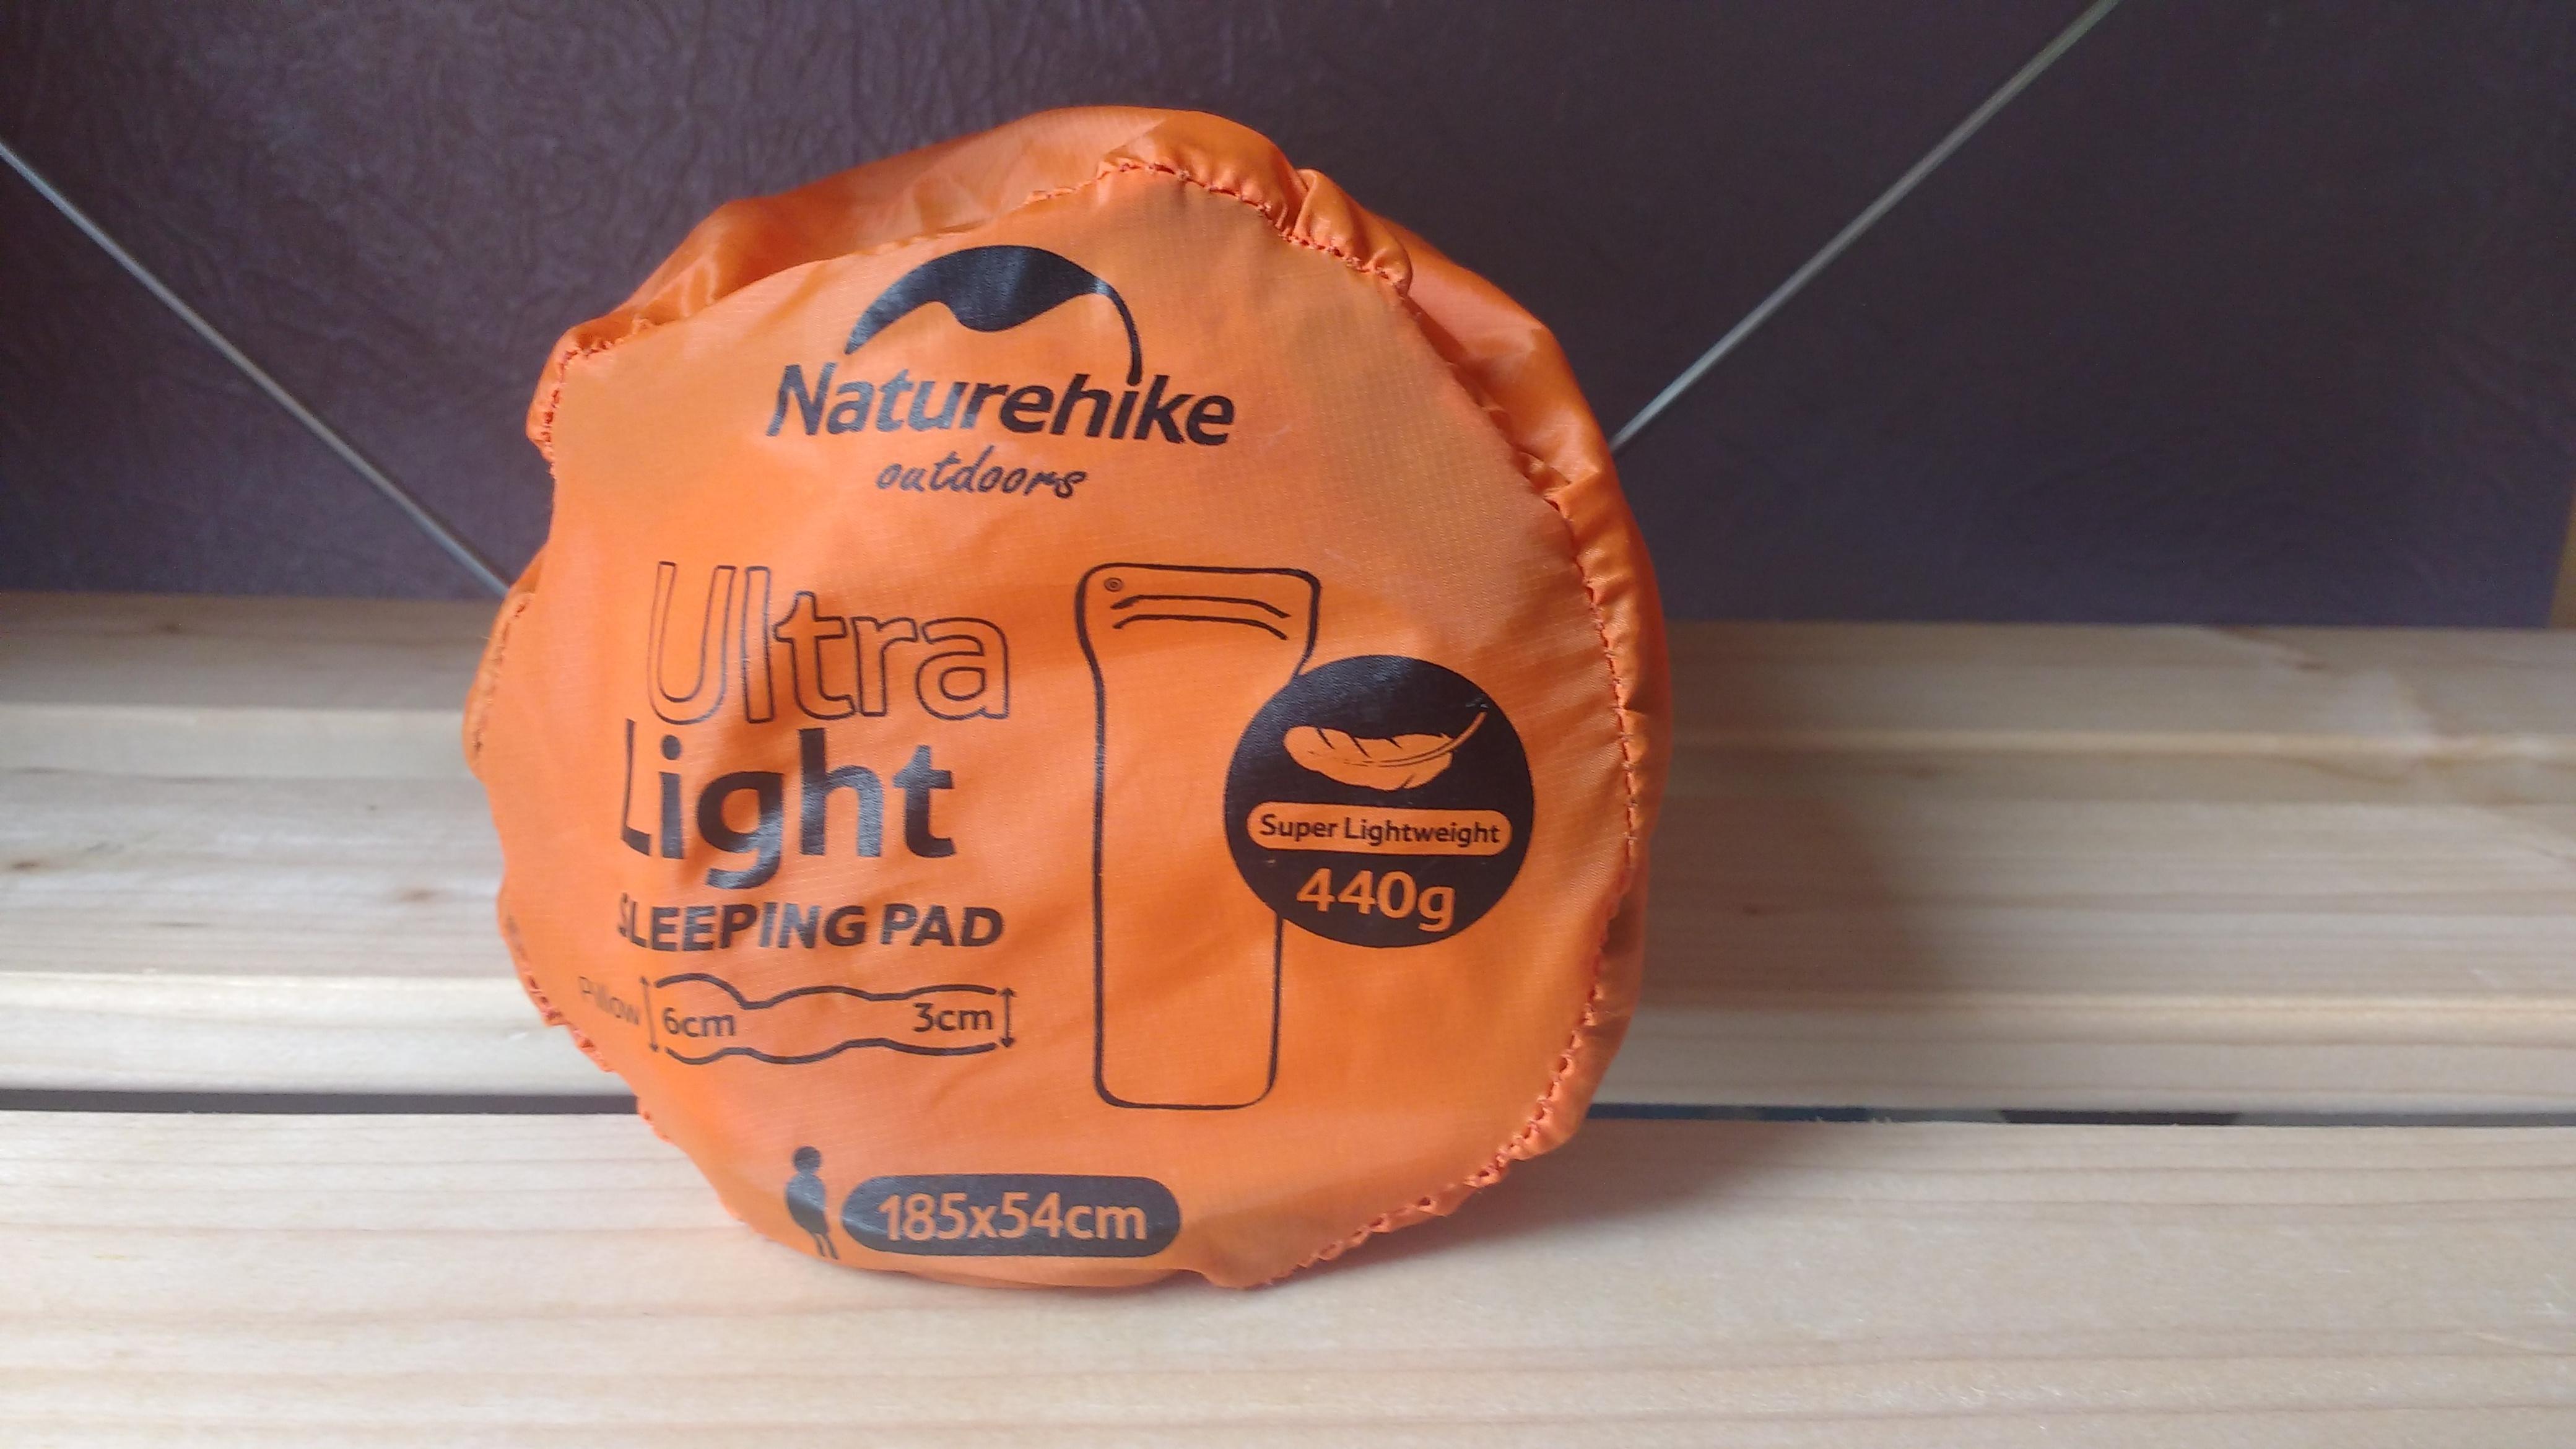 Ultralight Outdoor Gear List #2: For a sleeping mat, we've gone for the Naturehike Inflatable Mat